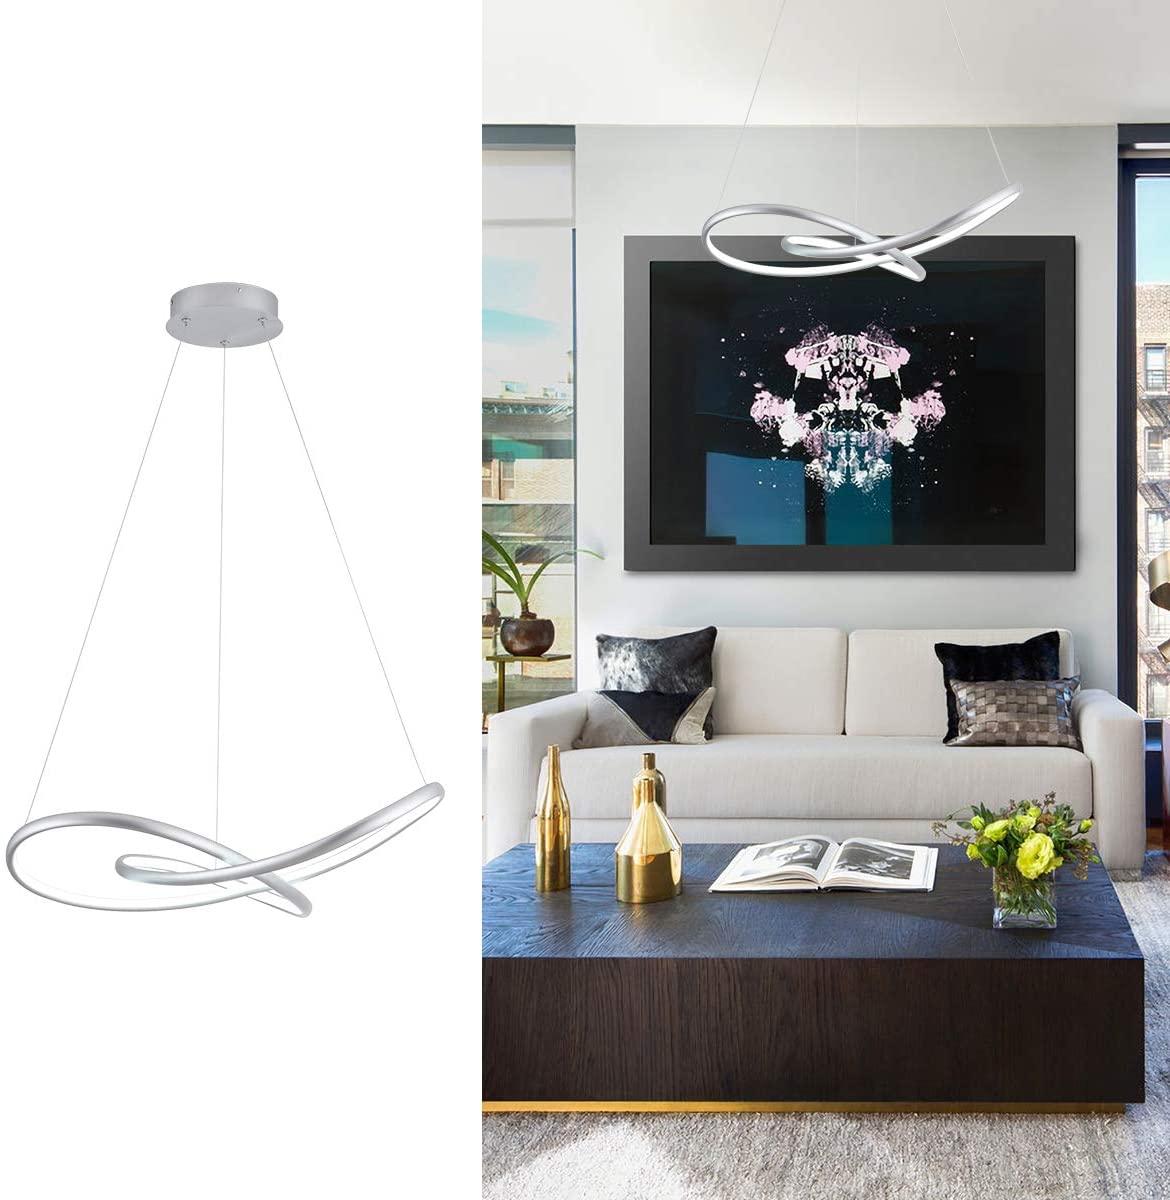 MADEM Modern LED Chandelier Dimmable Chic Circular LED Pendant Light Adjustable Irregular Pendant Lighting Contemporary Chandelier for Living Dining Room Bedroom Kitchen, Cool White 6000K, Silver